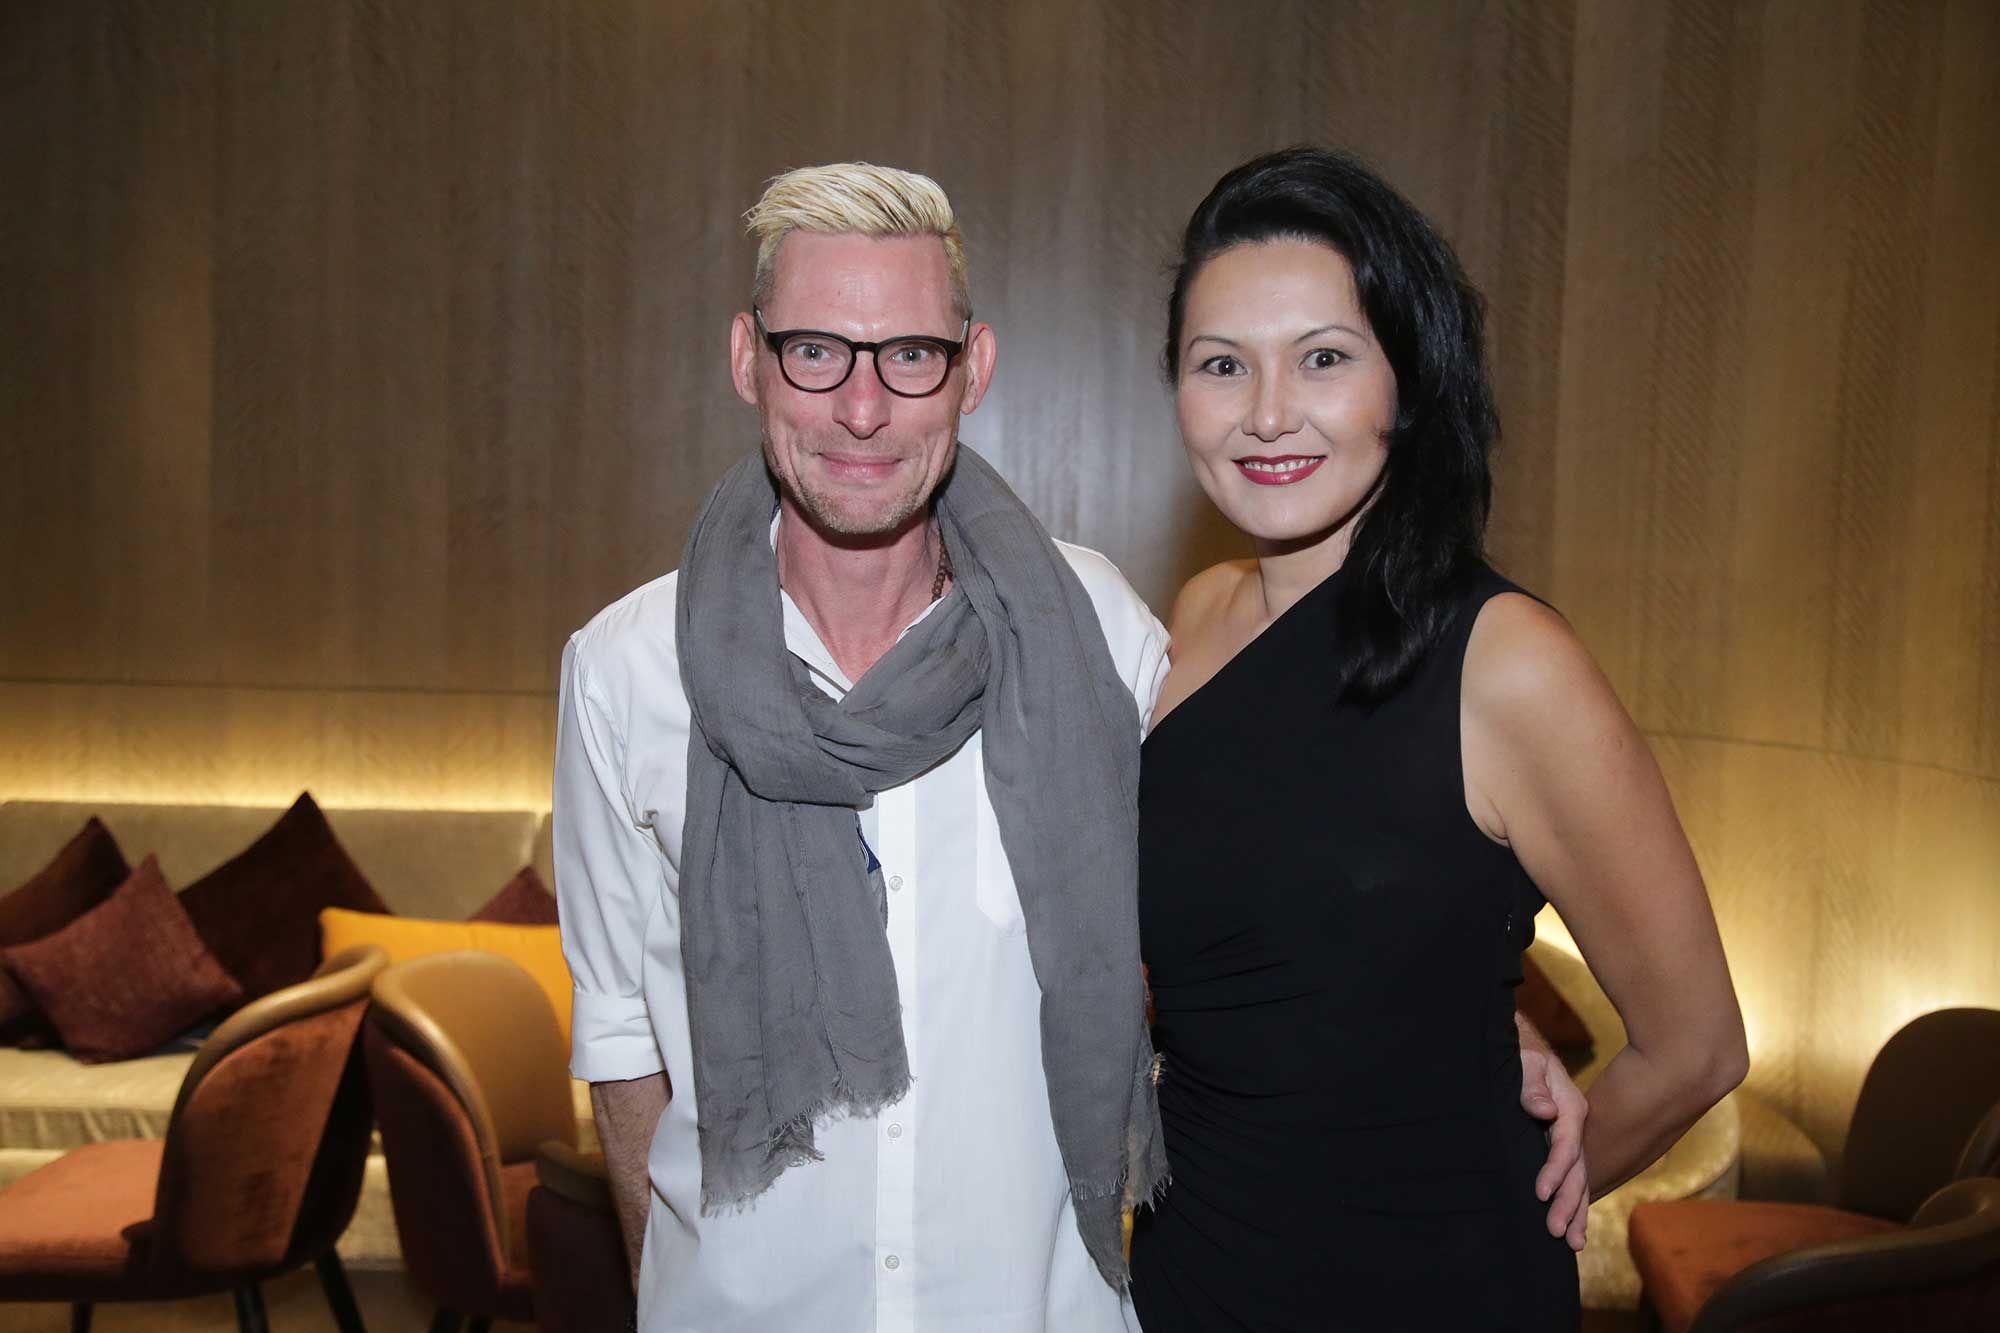 Emmanuel Stroobant and Edina Hong